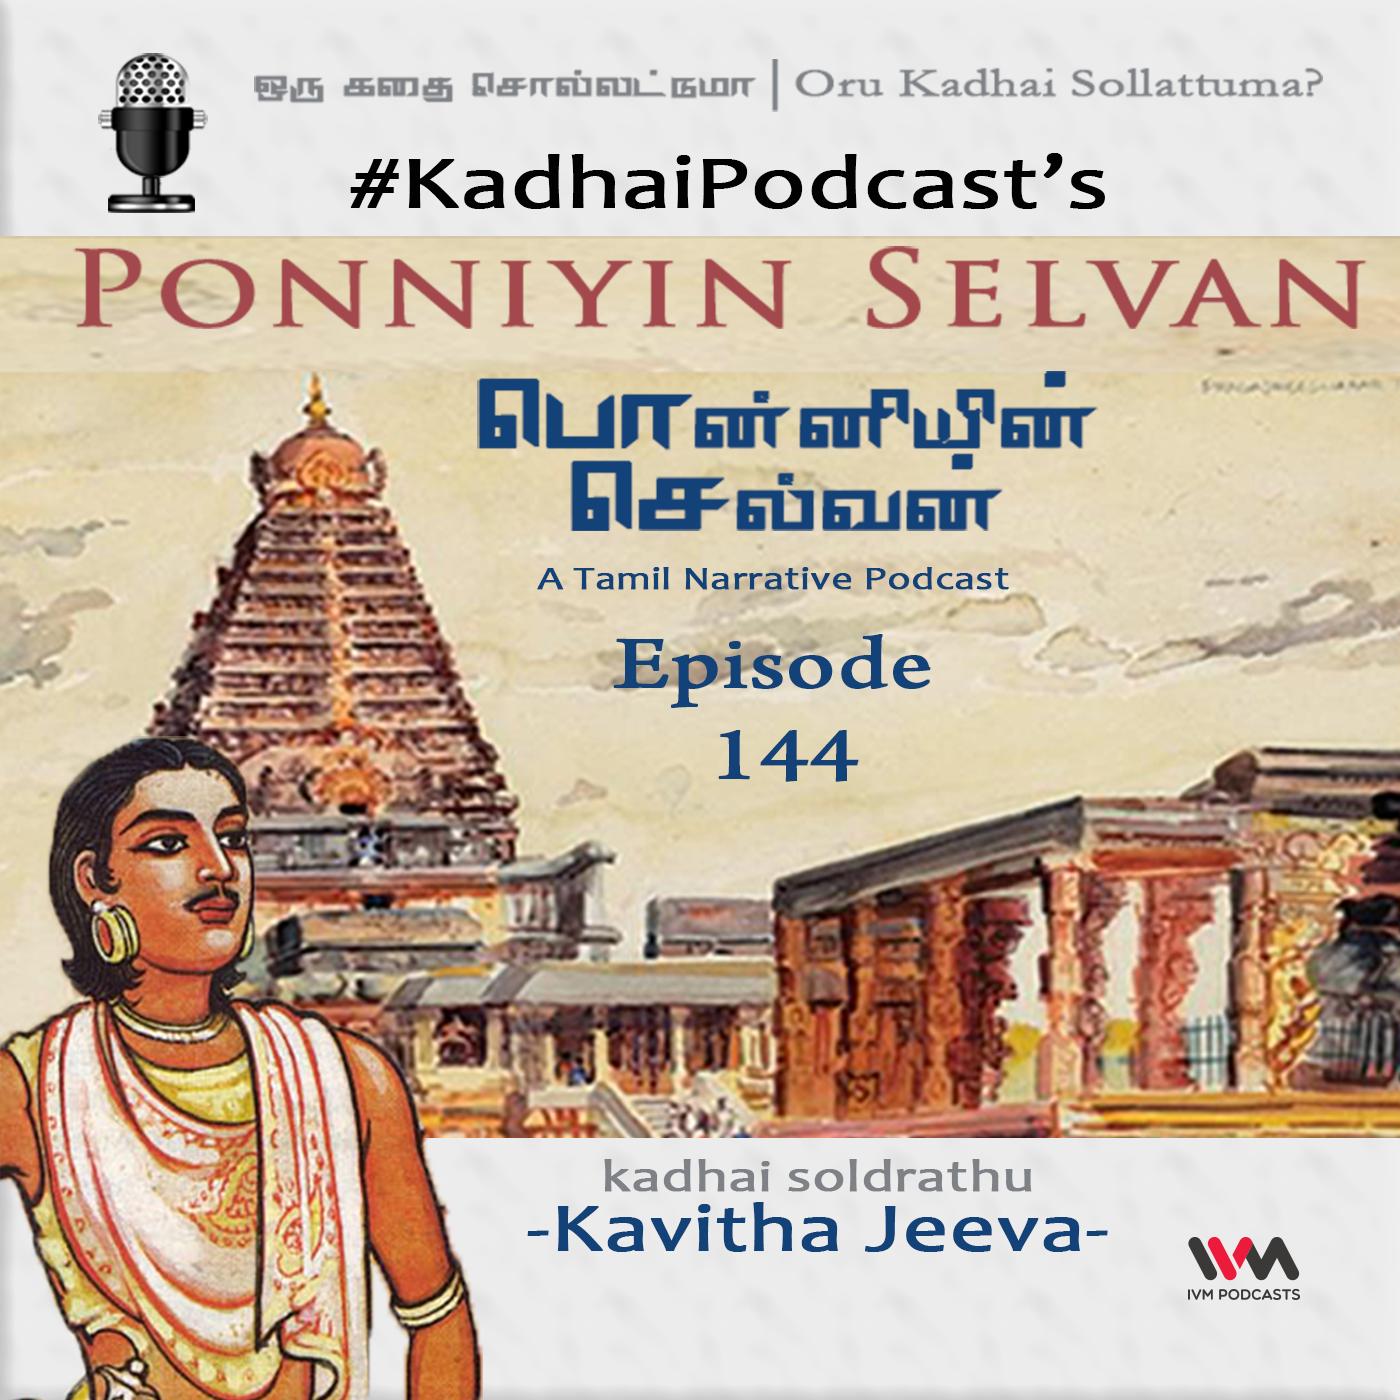 KadhaiPodcast's Ponniyin Selvan - Episode # 144